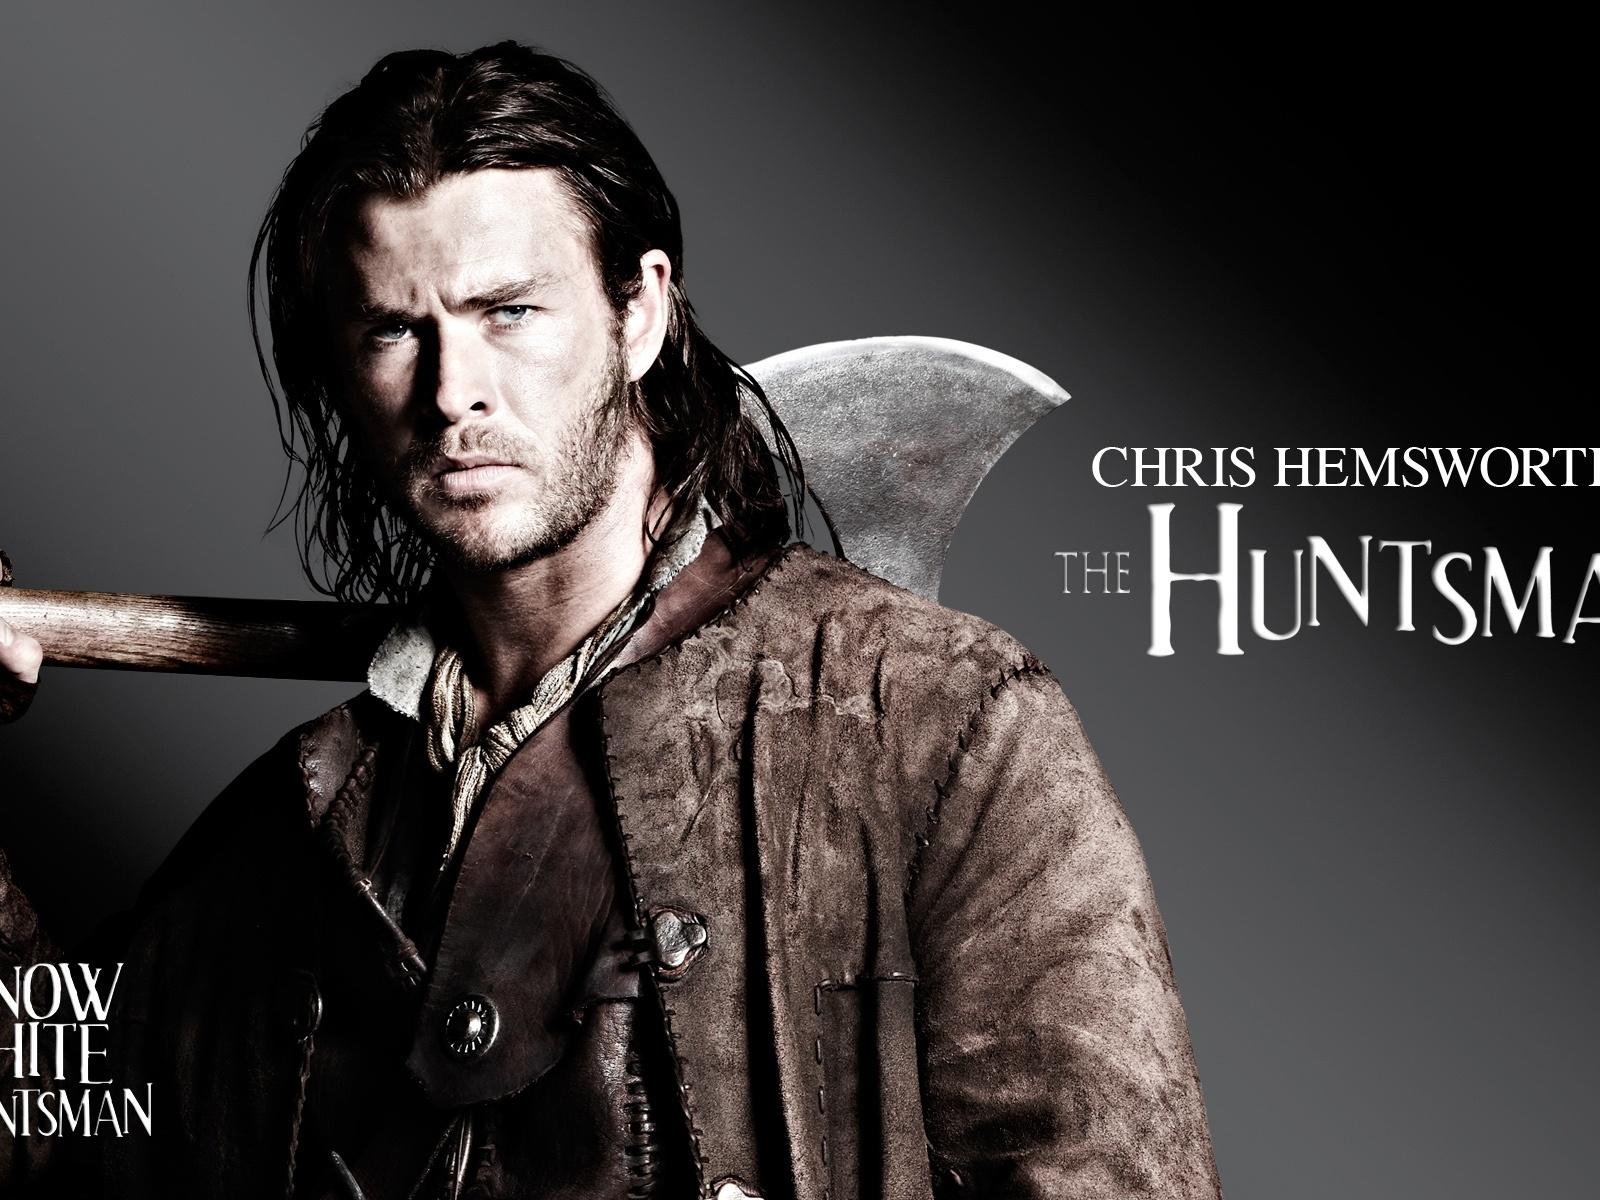 Chris Hemsworth hd Wallpapers 2013 Harry styles 2013 1600x1200